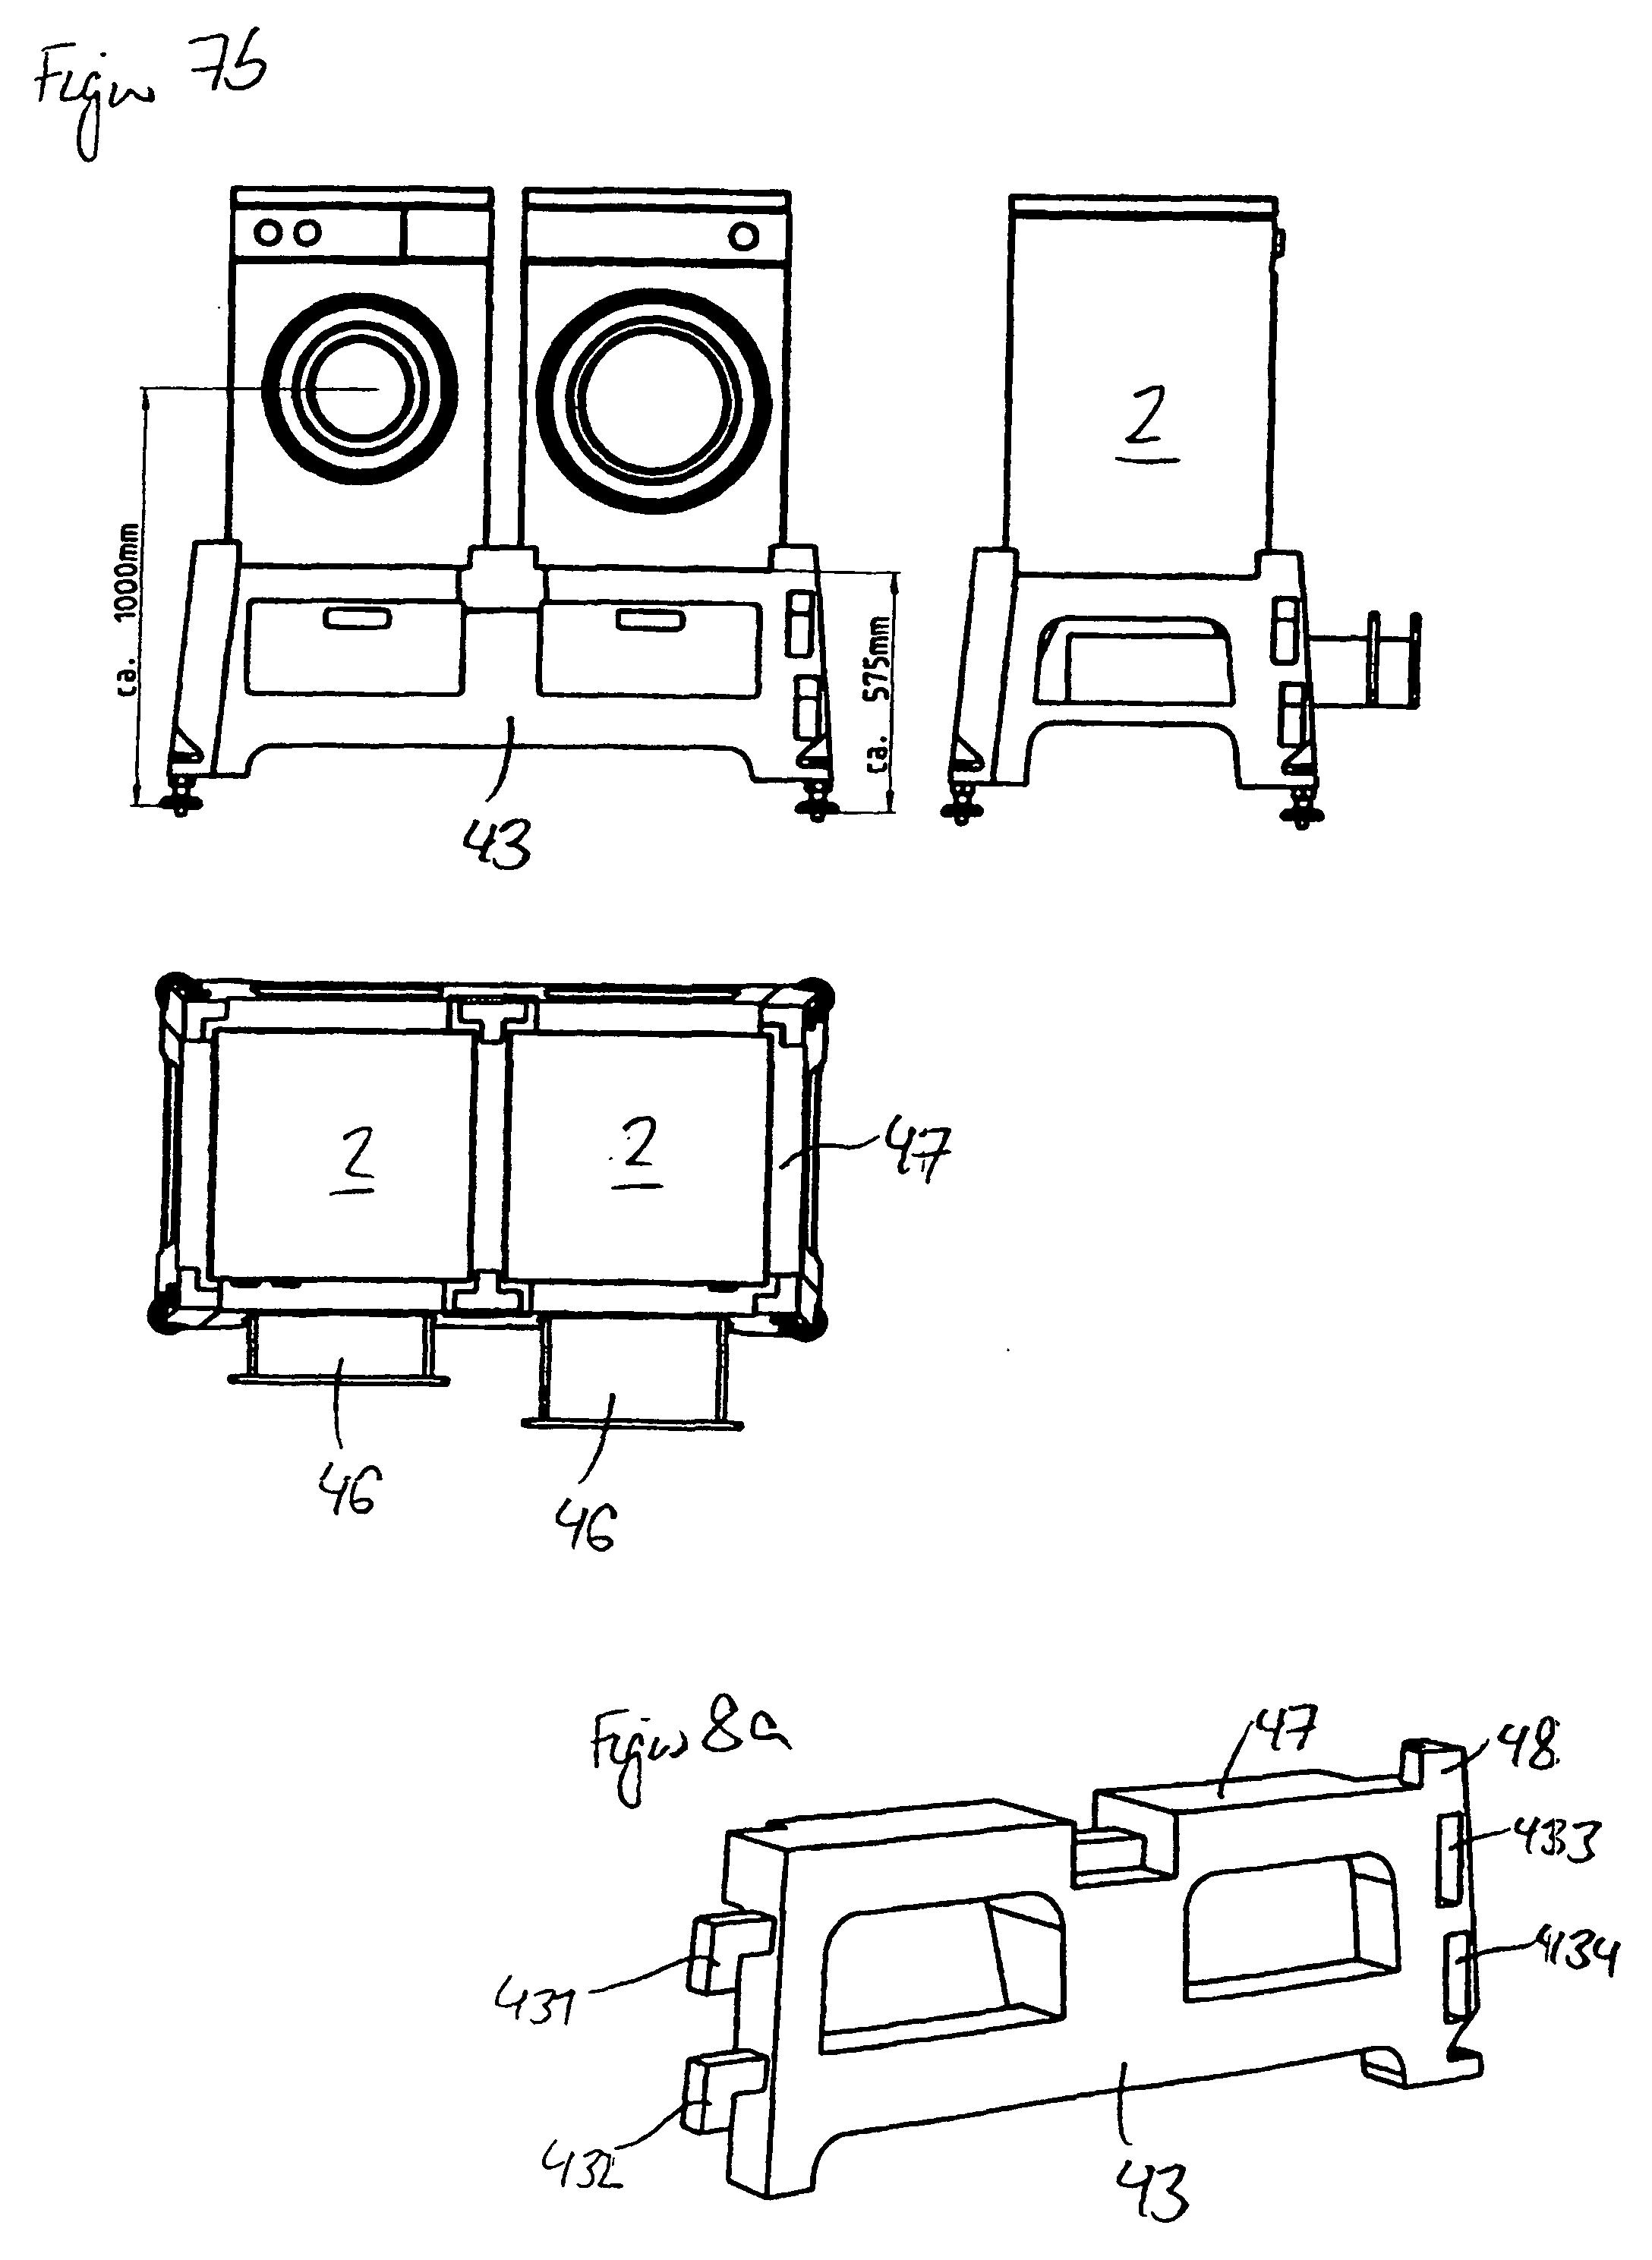 patent ep1205129b1 mehrteiliger sockel f r elektroger te insbesondere waschmaschinen google. Black Bedroom Furniture Sets. Home Design Ideas